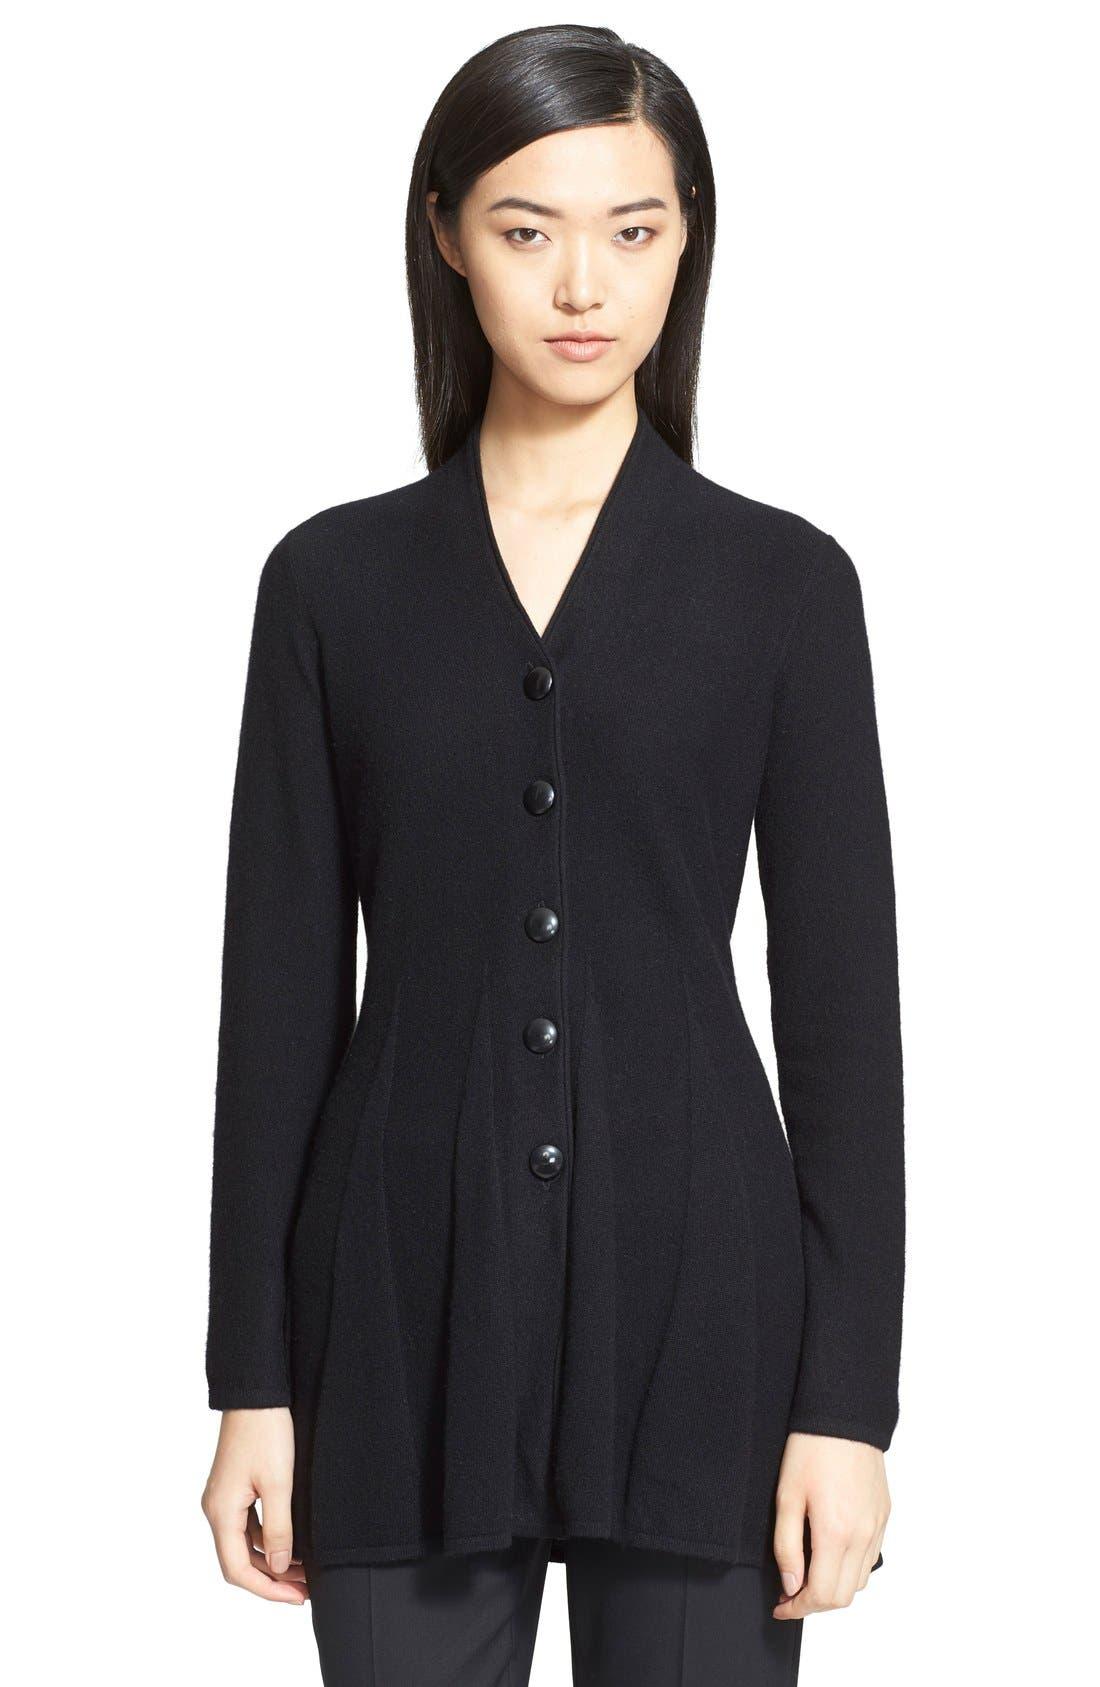 Alternate Image 1 Selected - Armani Collezioni Godet Pleat Cashmere Cardigan